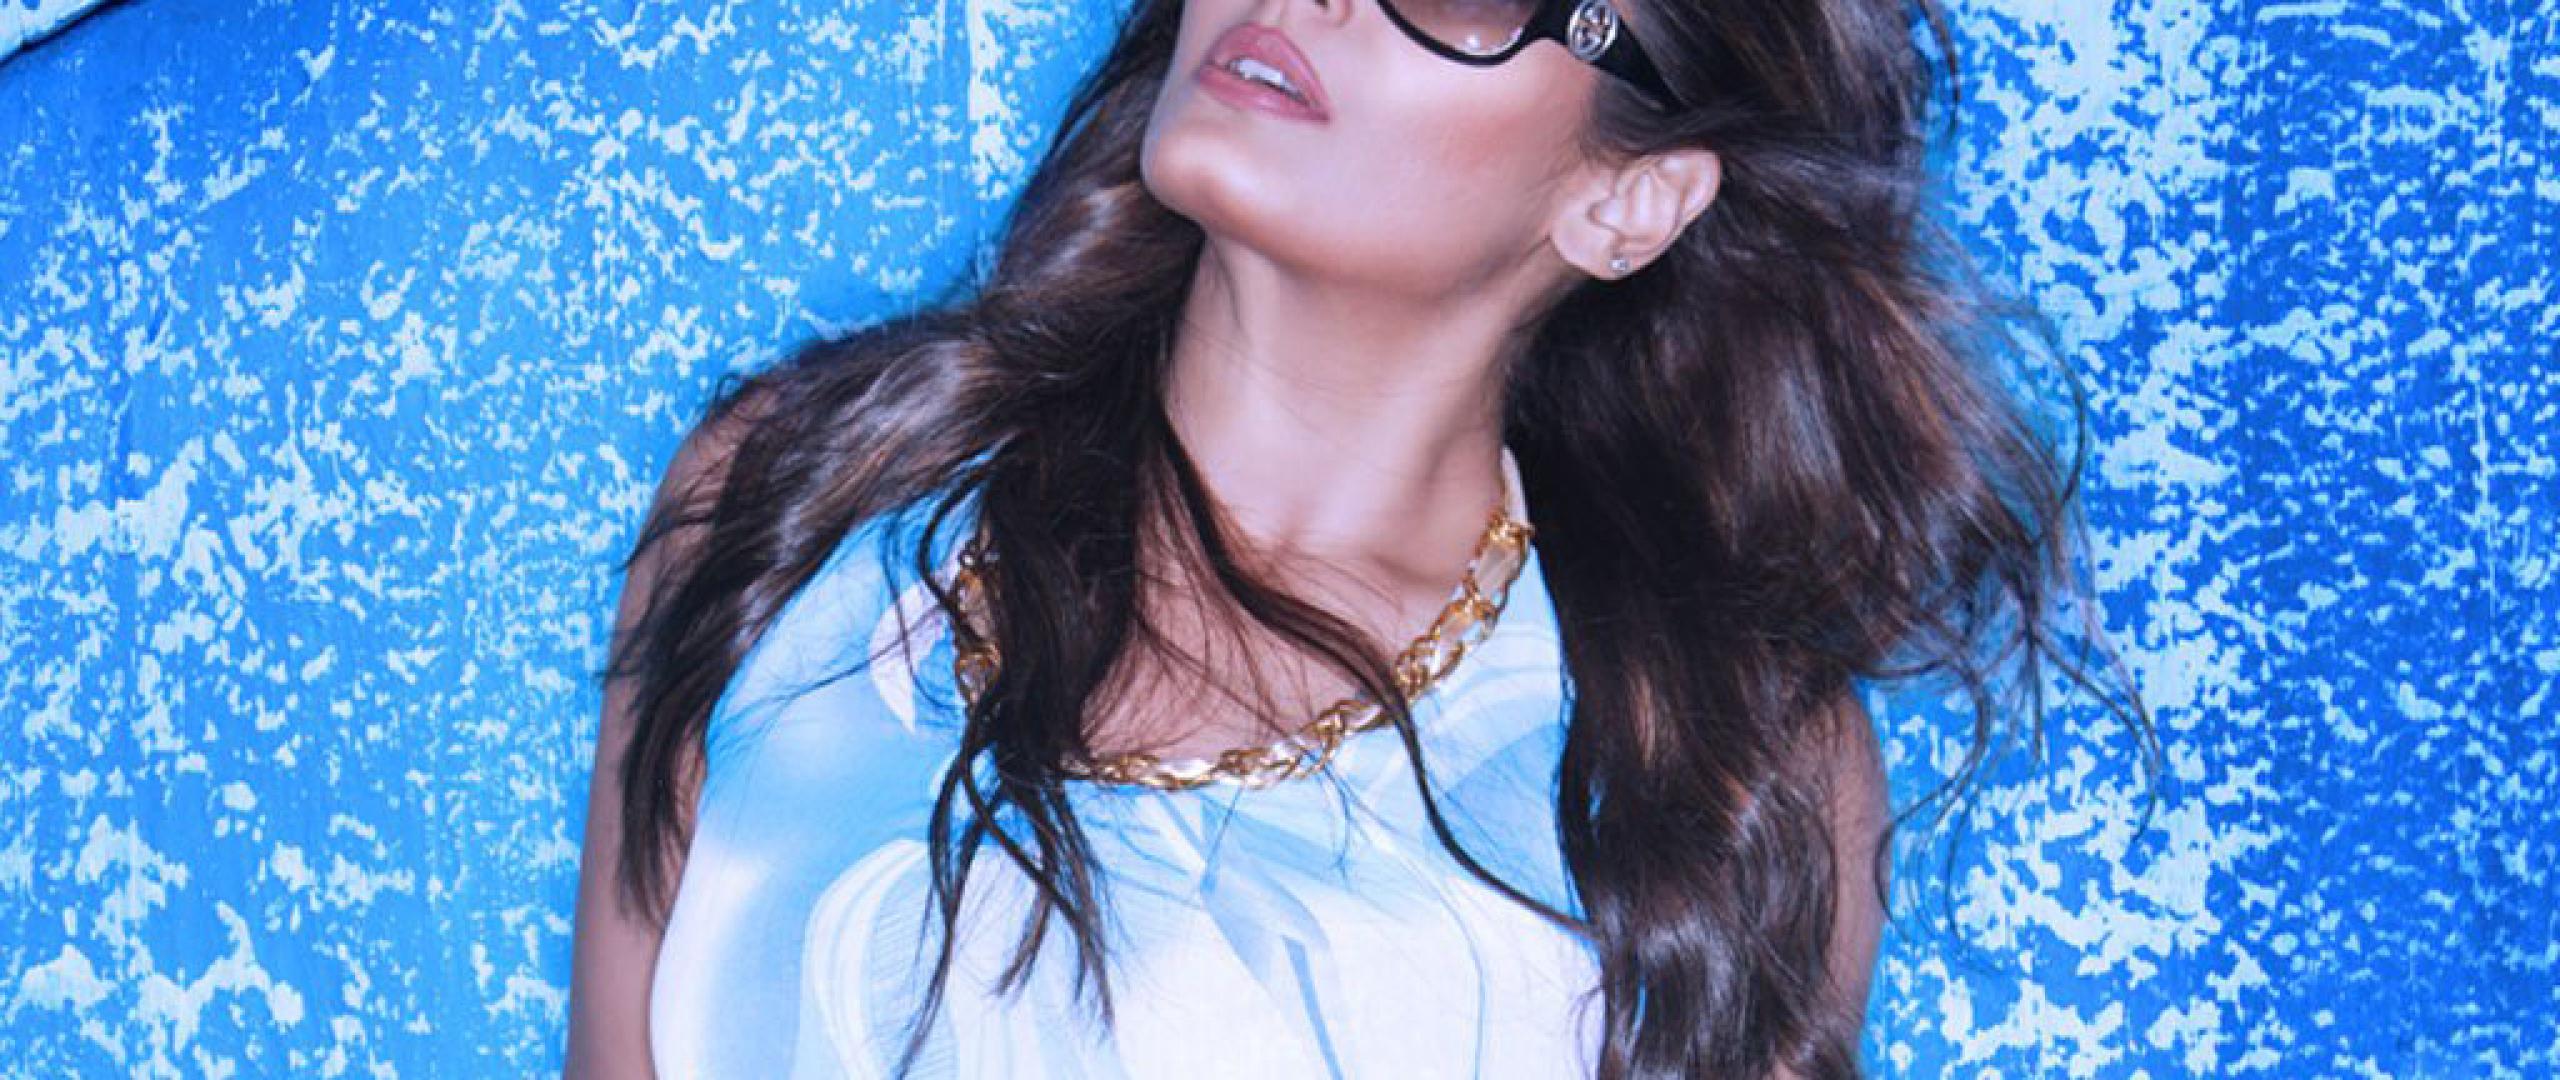 Raveena Tandon 1080p Images